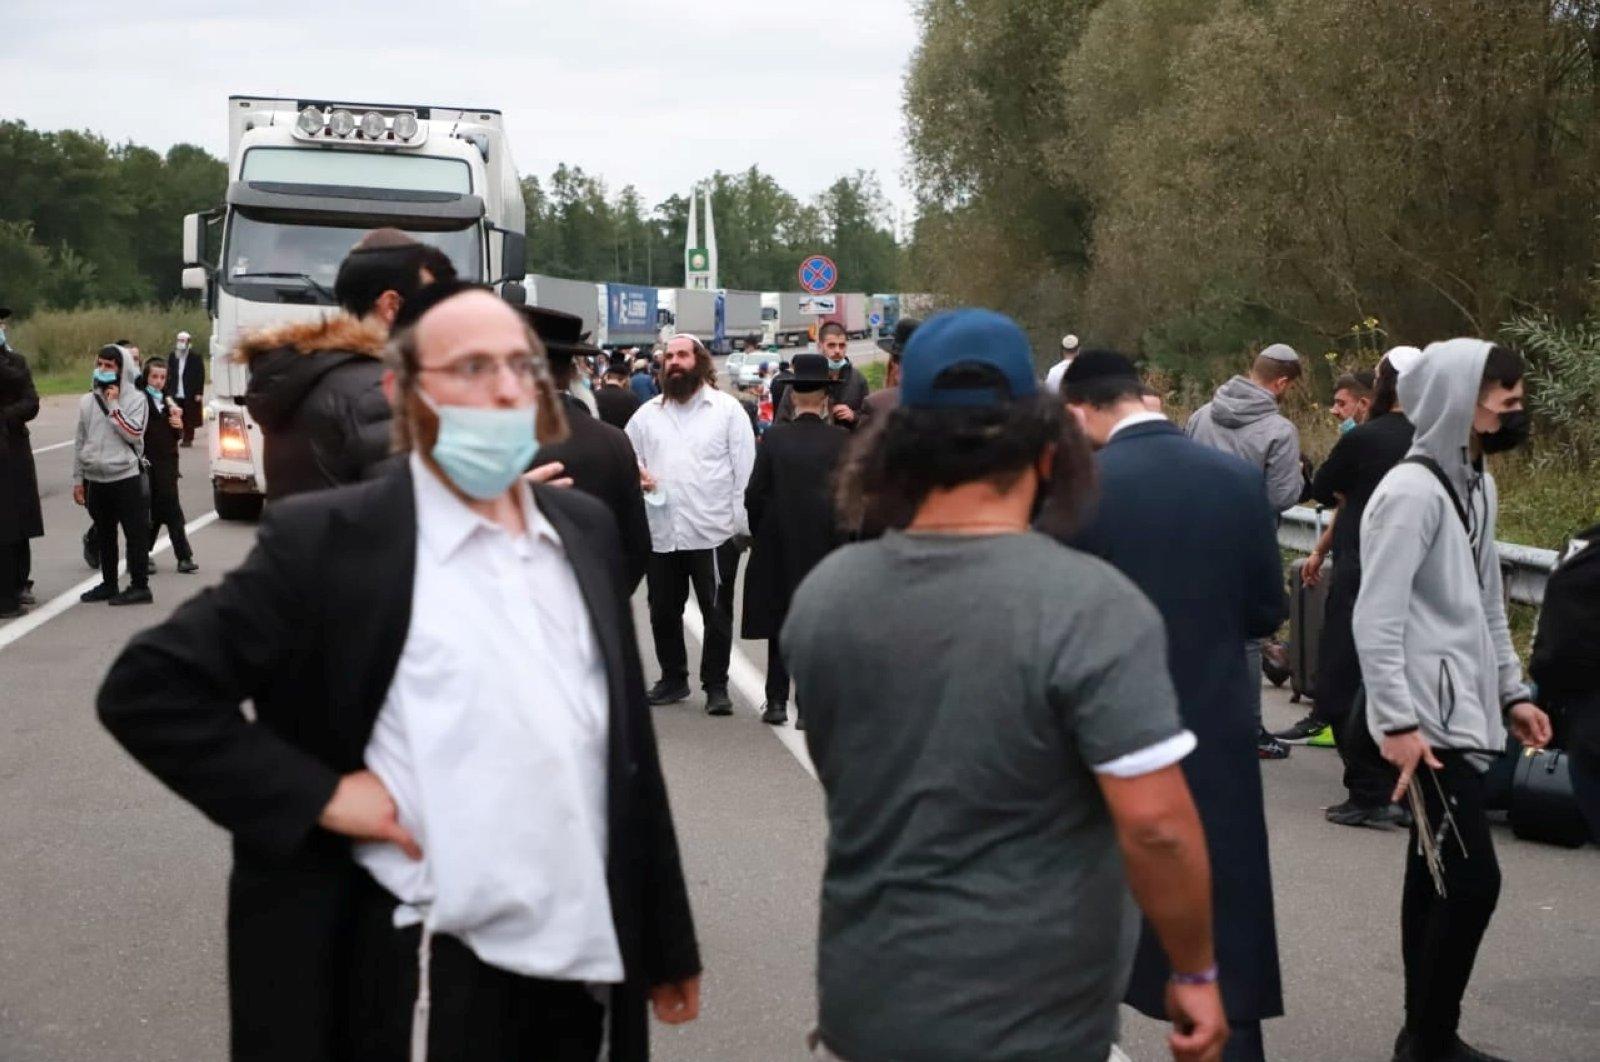 Jewish pilgrims, who plan to enter Ukraine from the territory of Belarus, gather at Novi Yarylovychi crossing point in Chernihiv Region, Ukraine Sept. 14, 2020. (State Border Guard Service of Ukraine via Reuters)